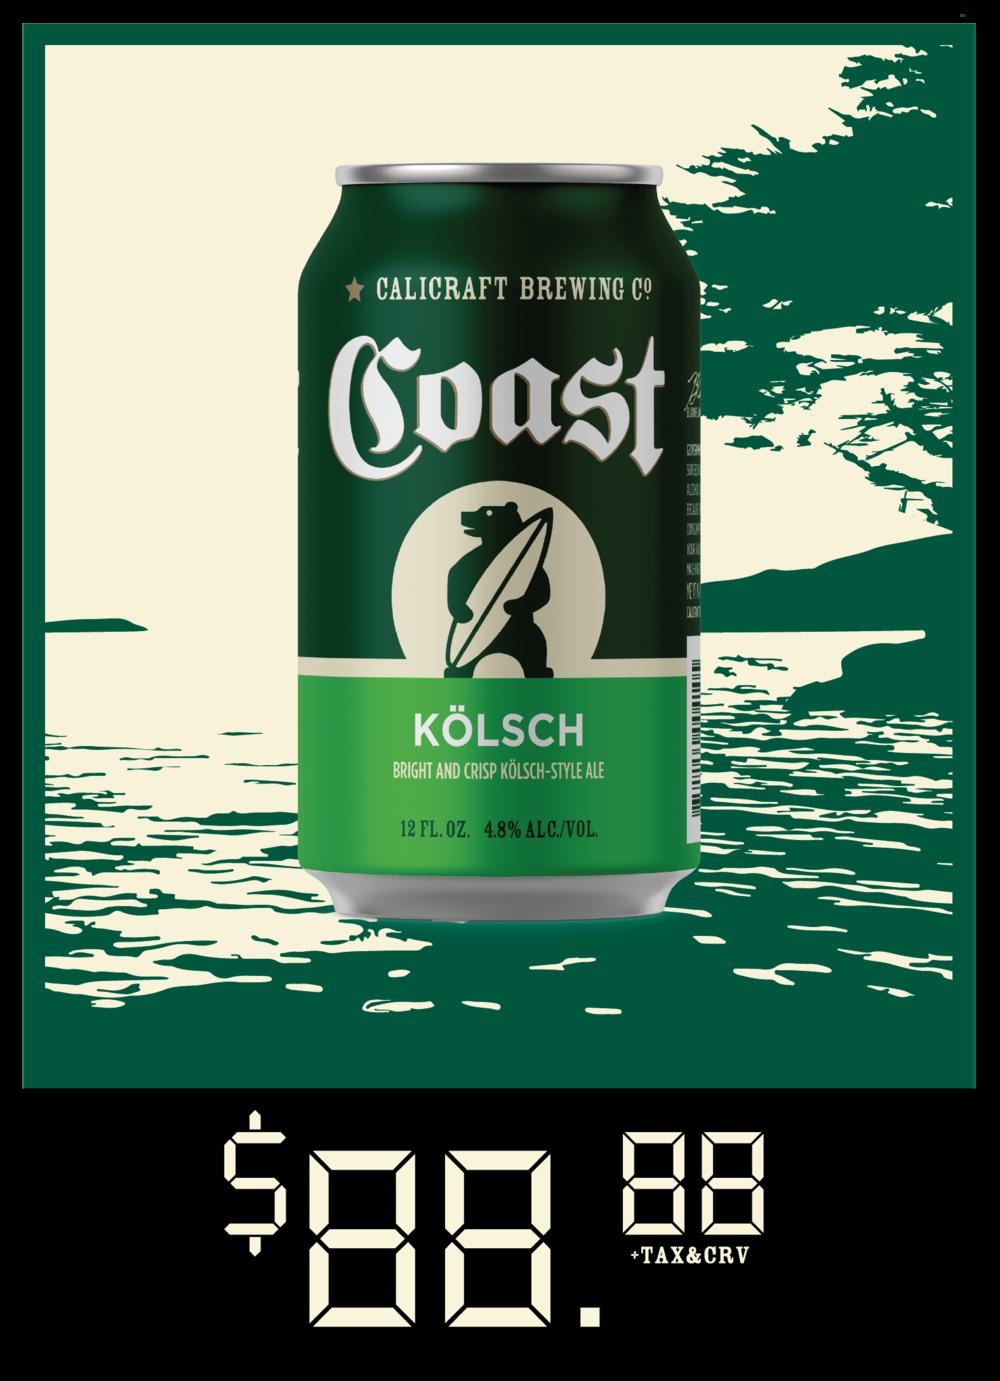 Coast_5x7-01.png